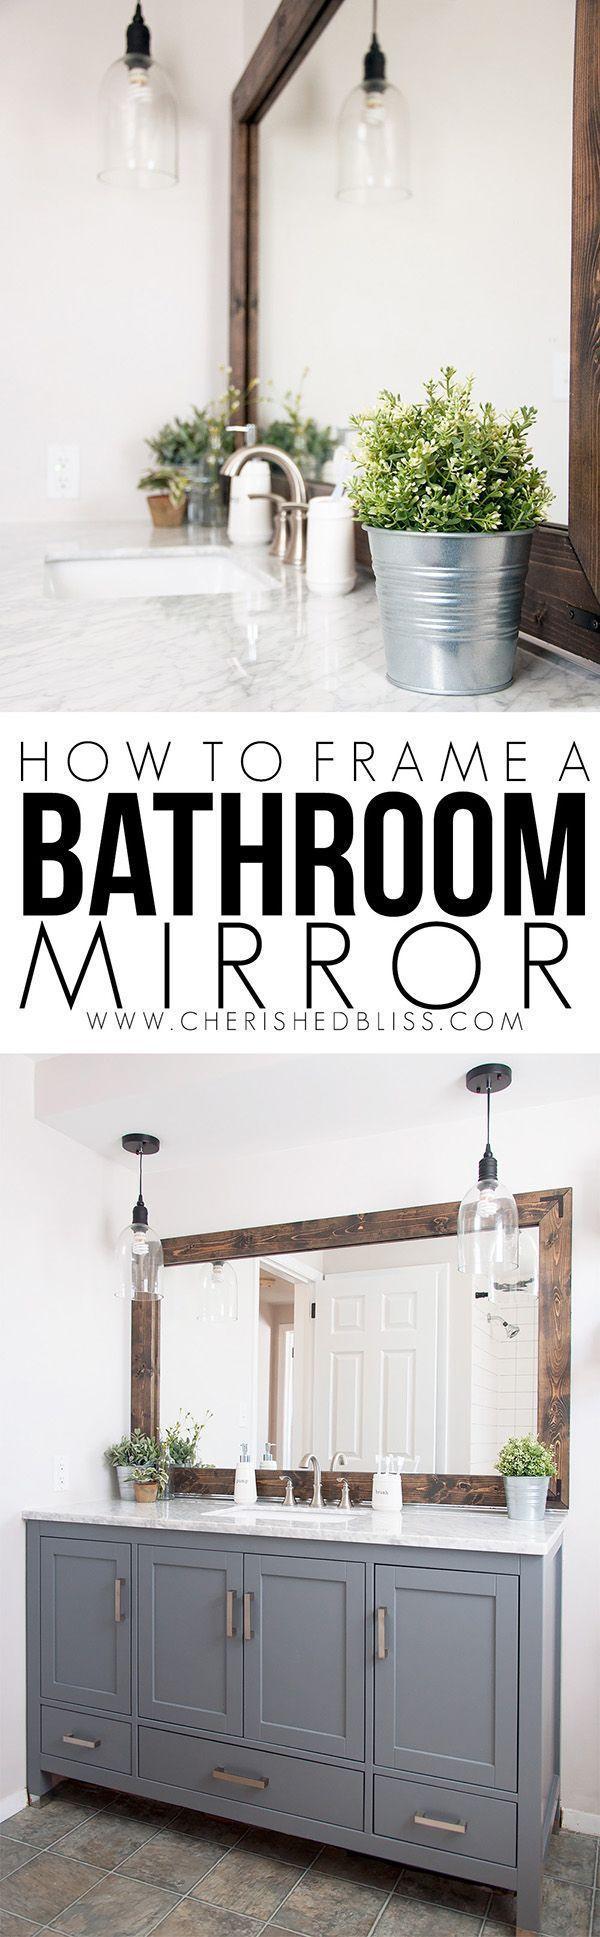 3b904c562def4d9c290d80cc9d0bd5b6 bathroom mirror frames framed mirrors